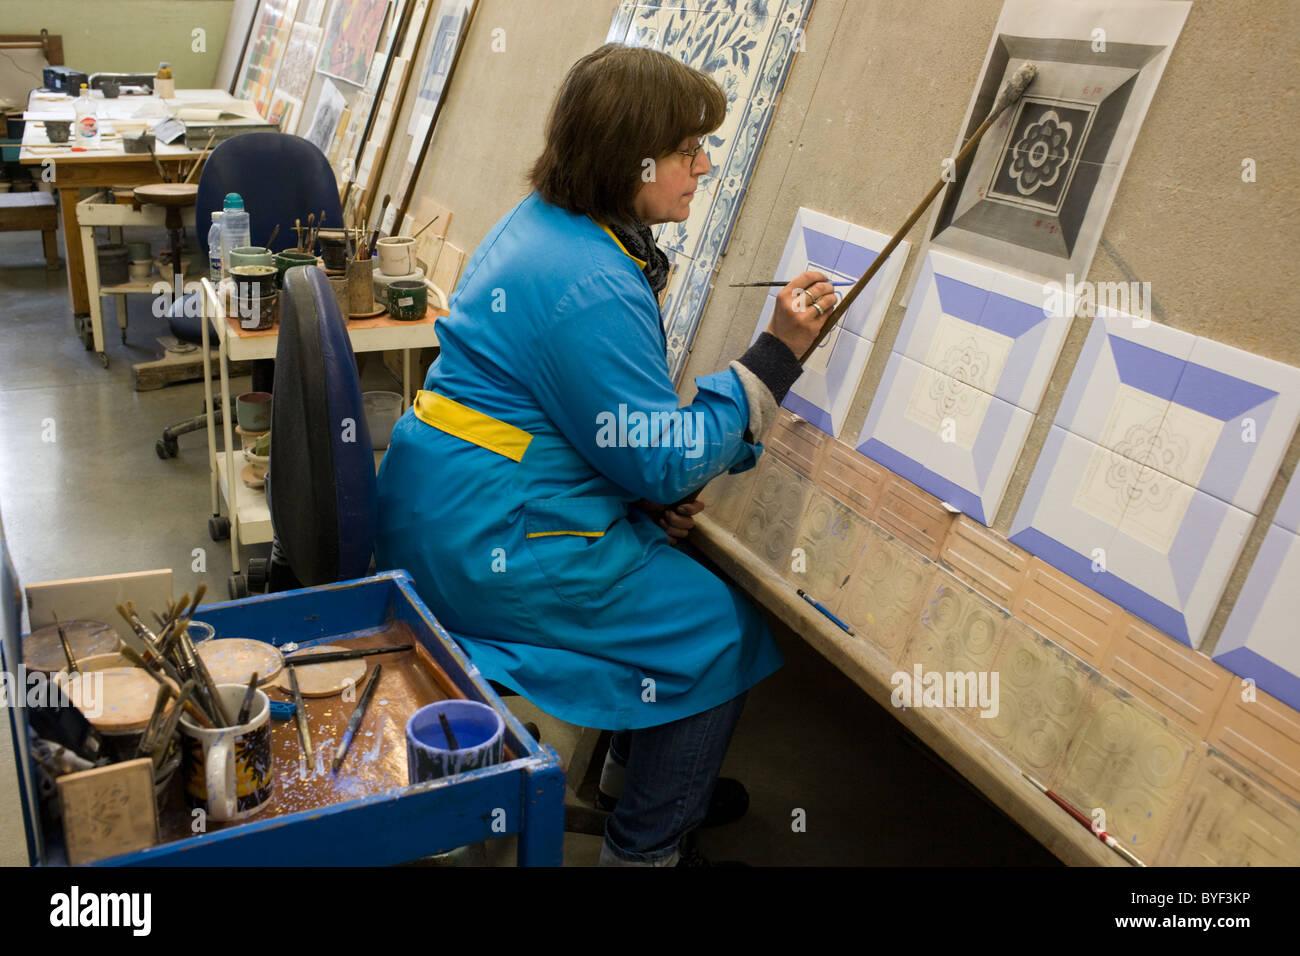 Woman hand apinting a tile design at Viúva Lamego factory near Sintra, Portugal - Stock Image